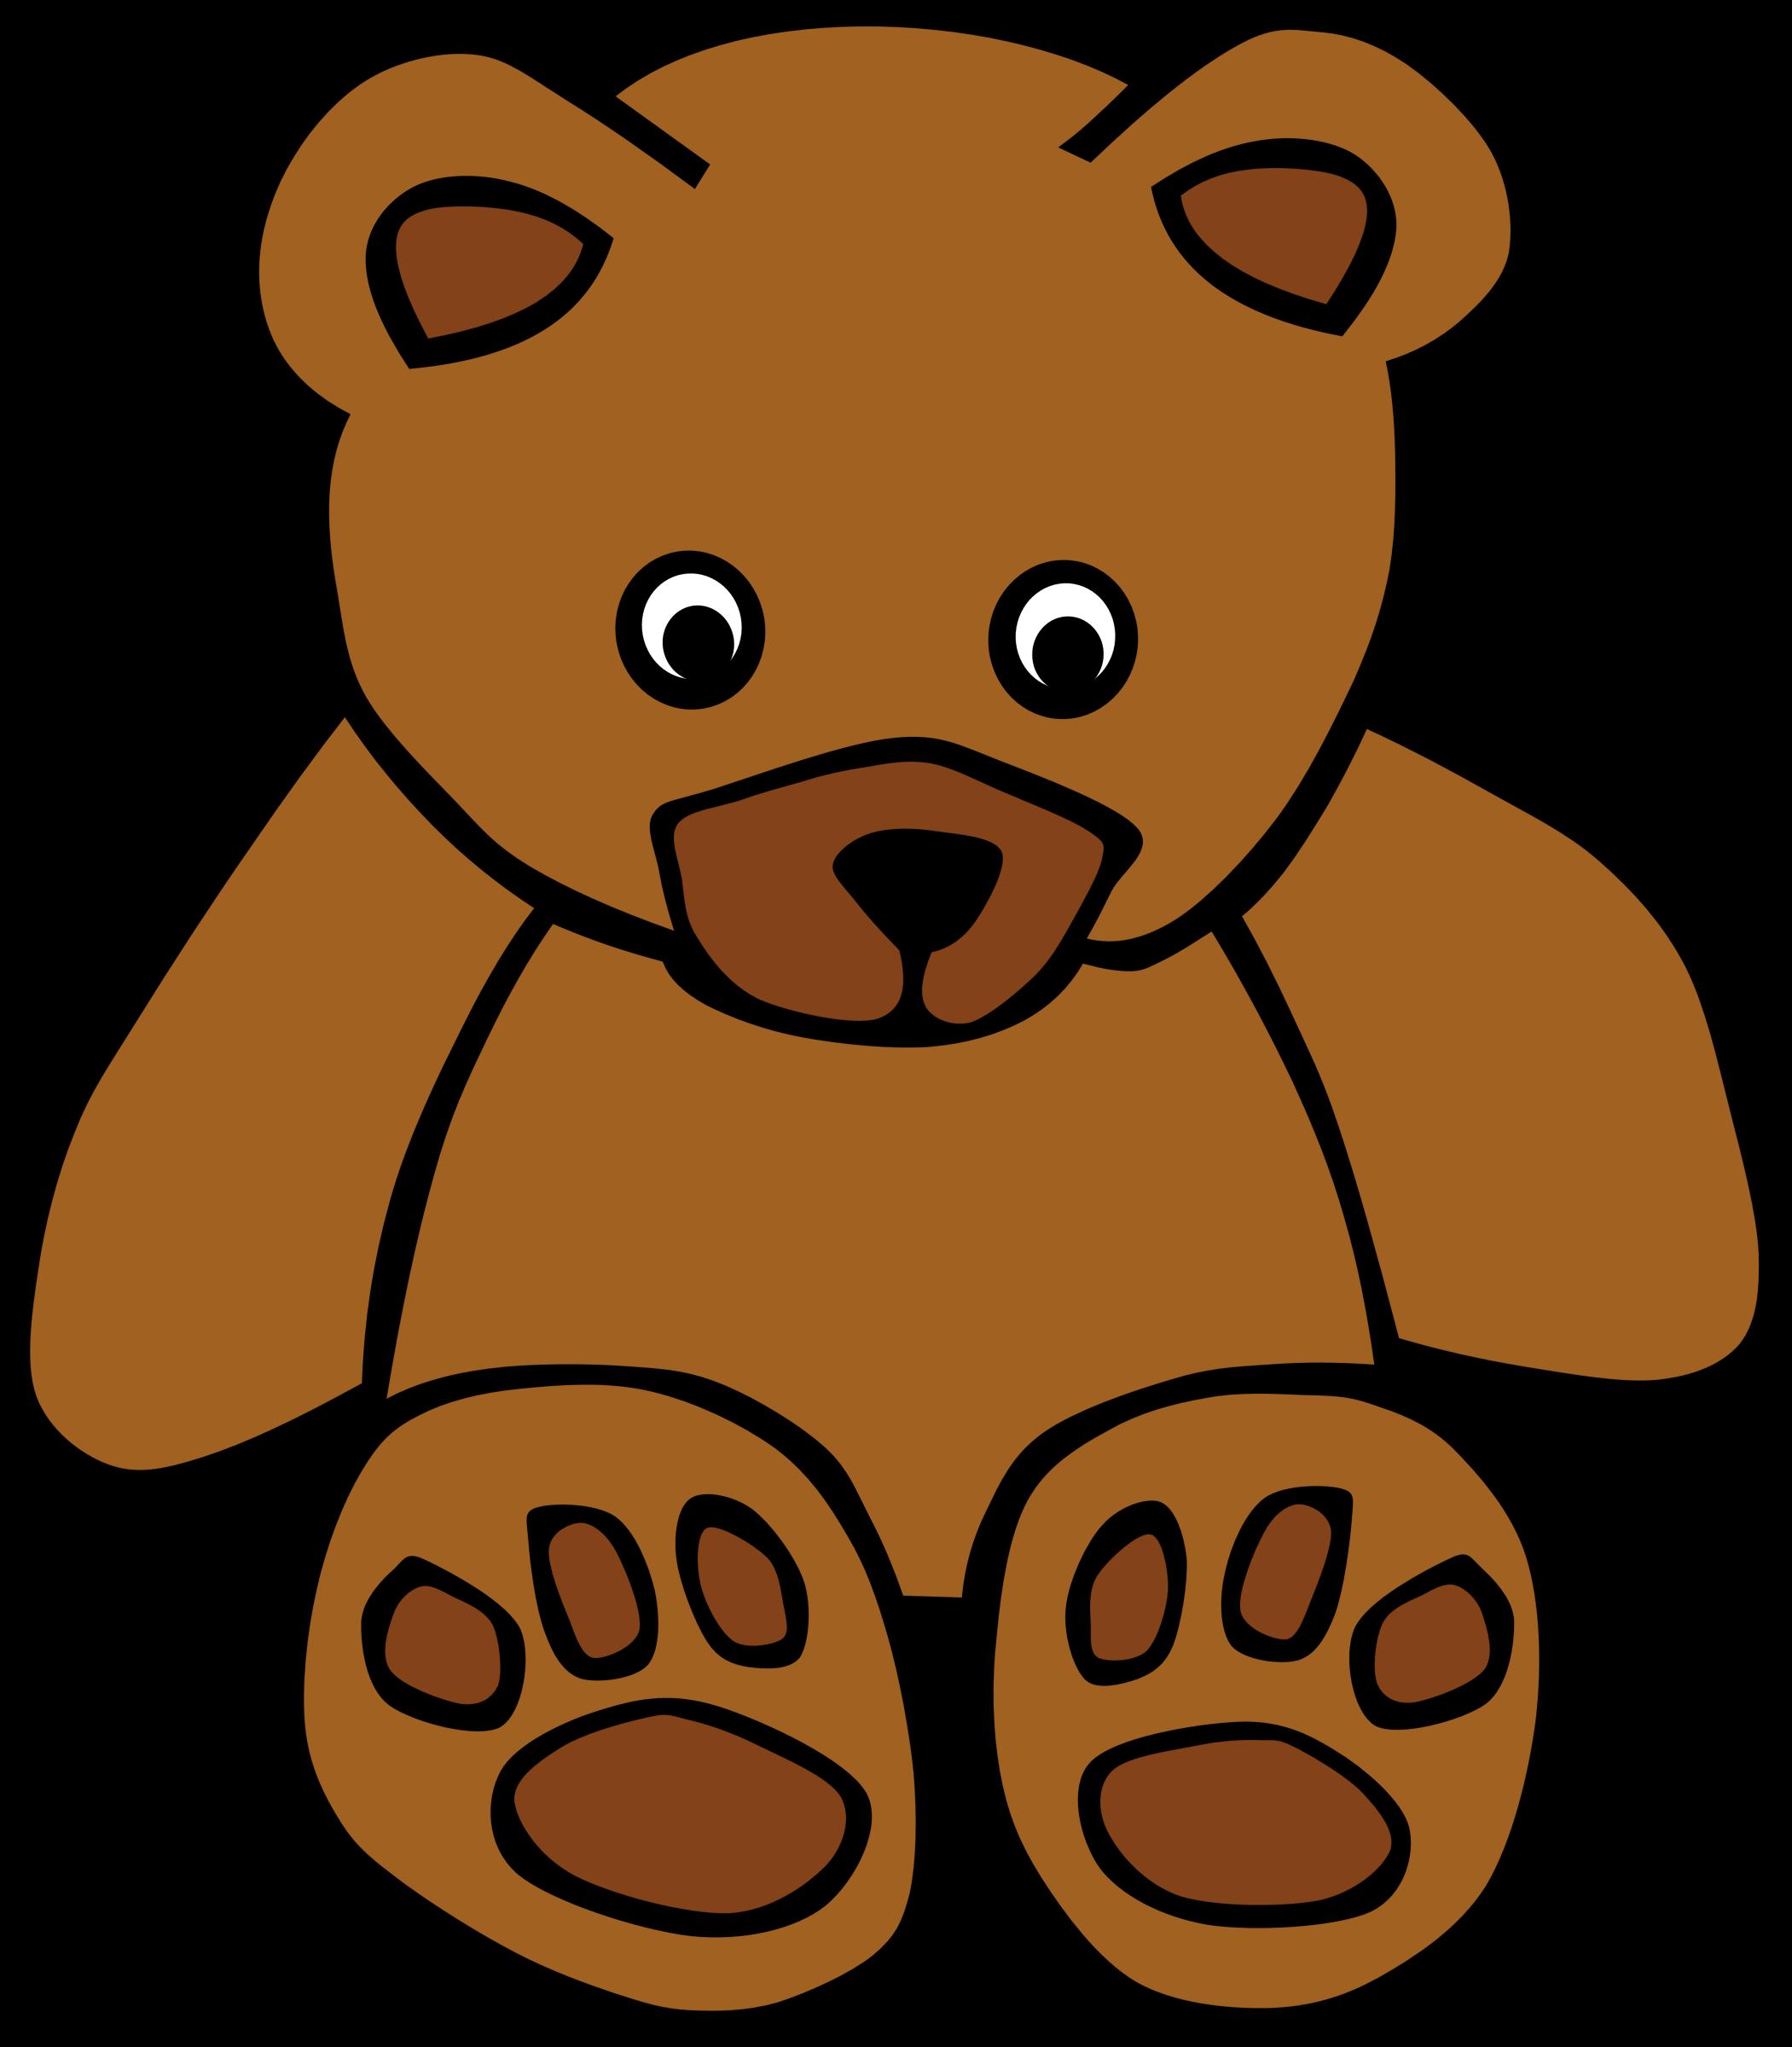 Halloween teddy bear clipart png freeuse download Simple Teddy Bear Icons PNG - Free PNG and Icons Downloads png freeuse download